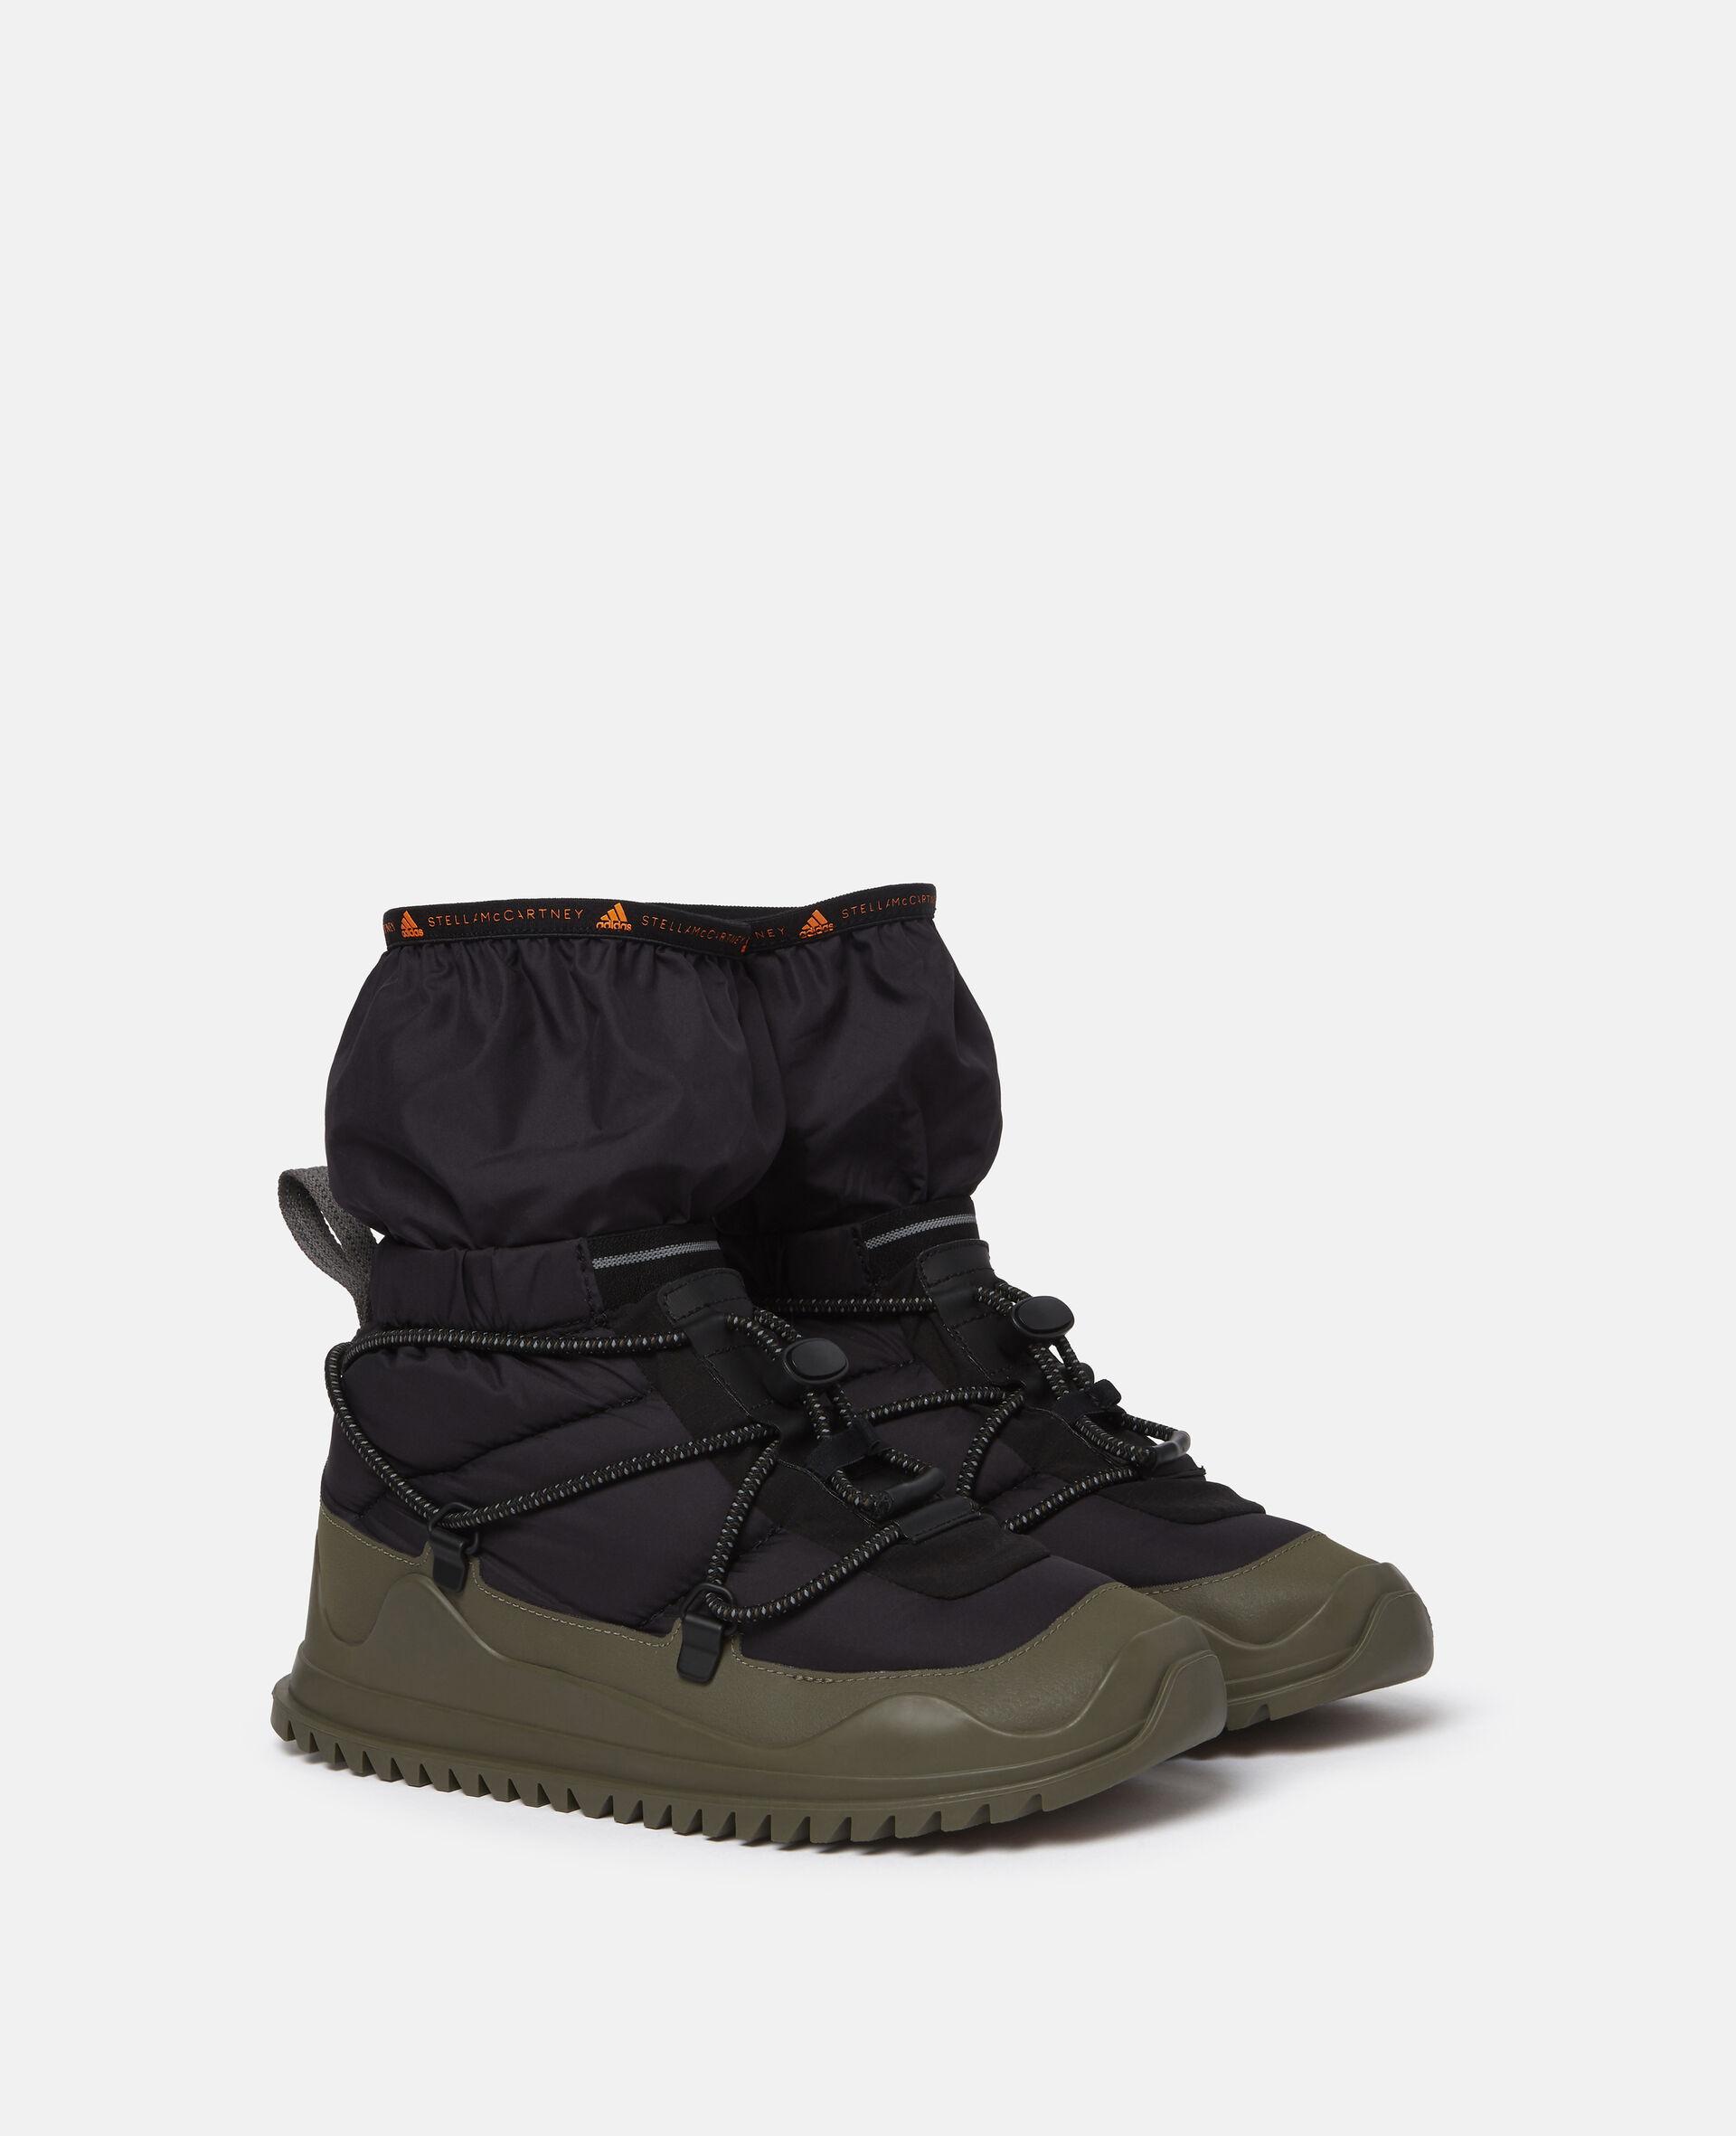 Winter Boots-Black-large image number 1